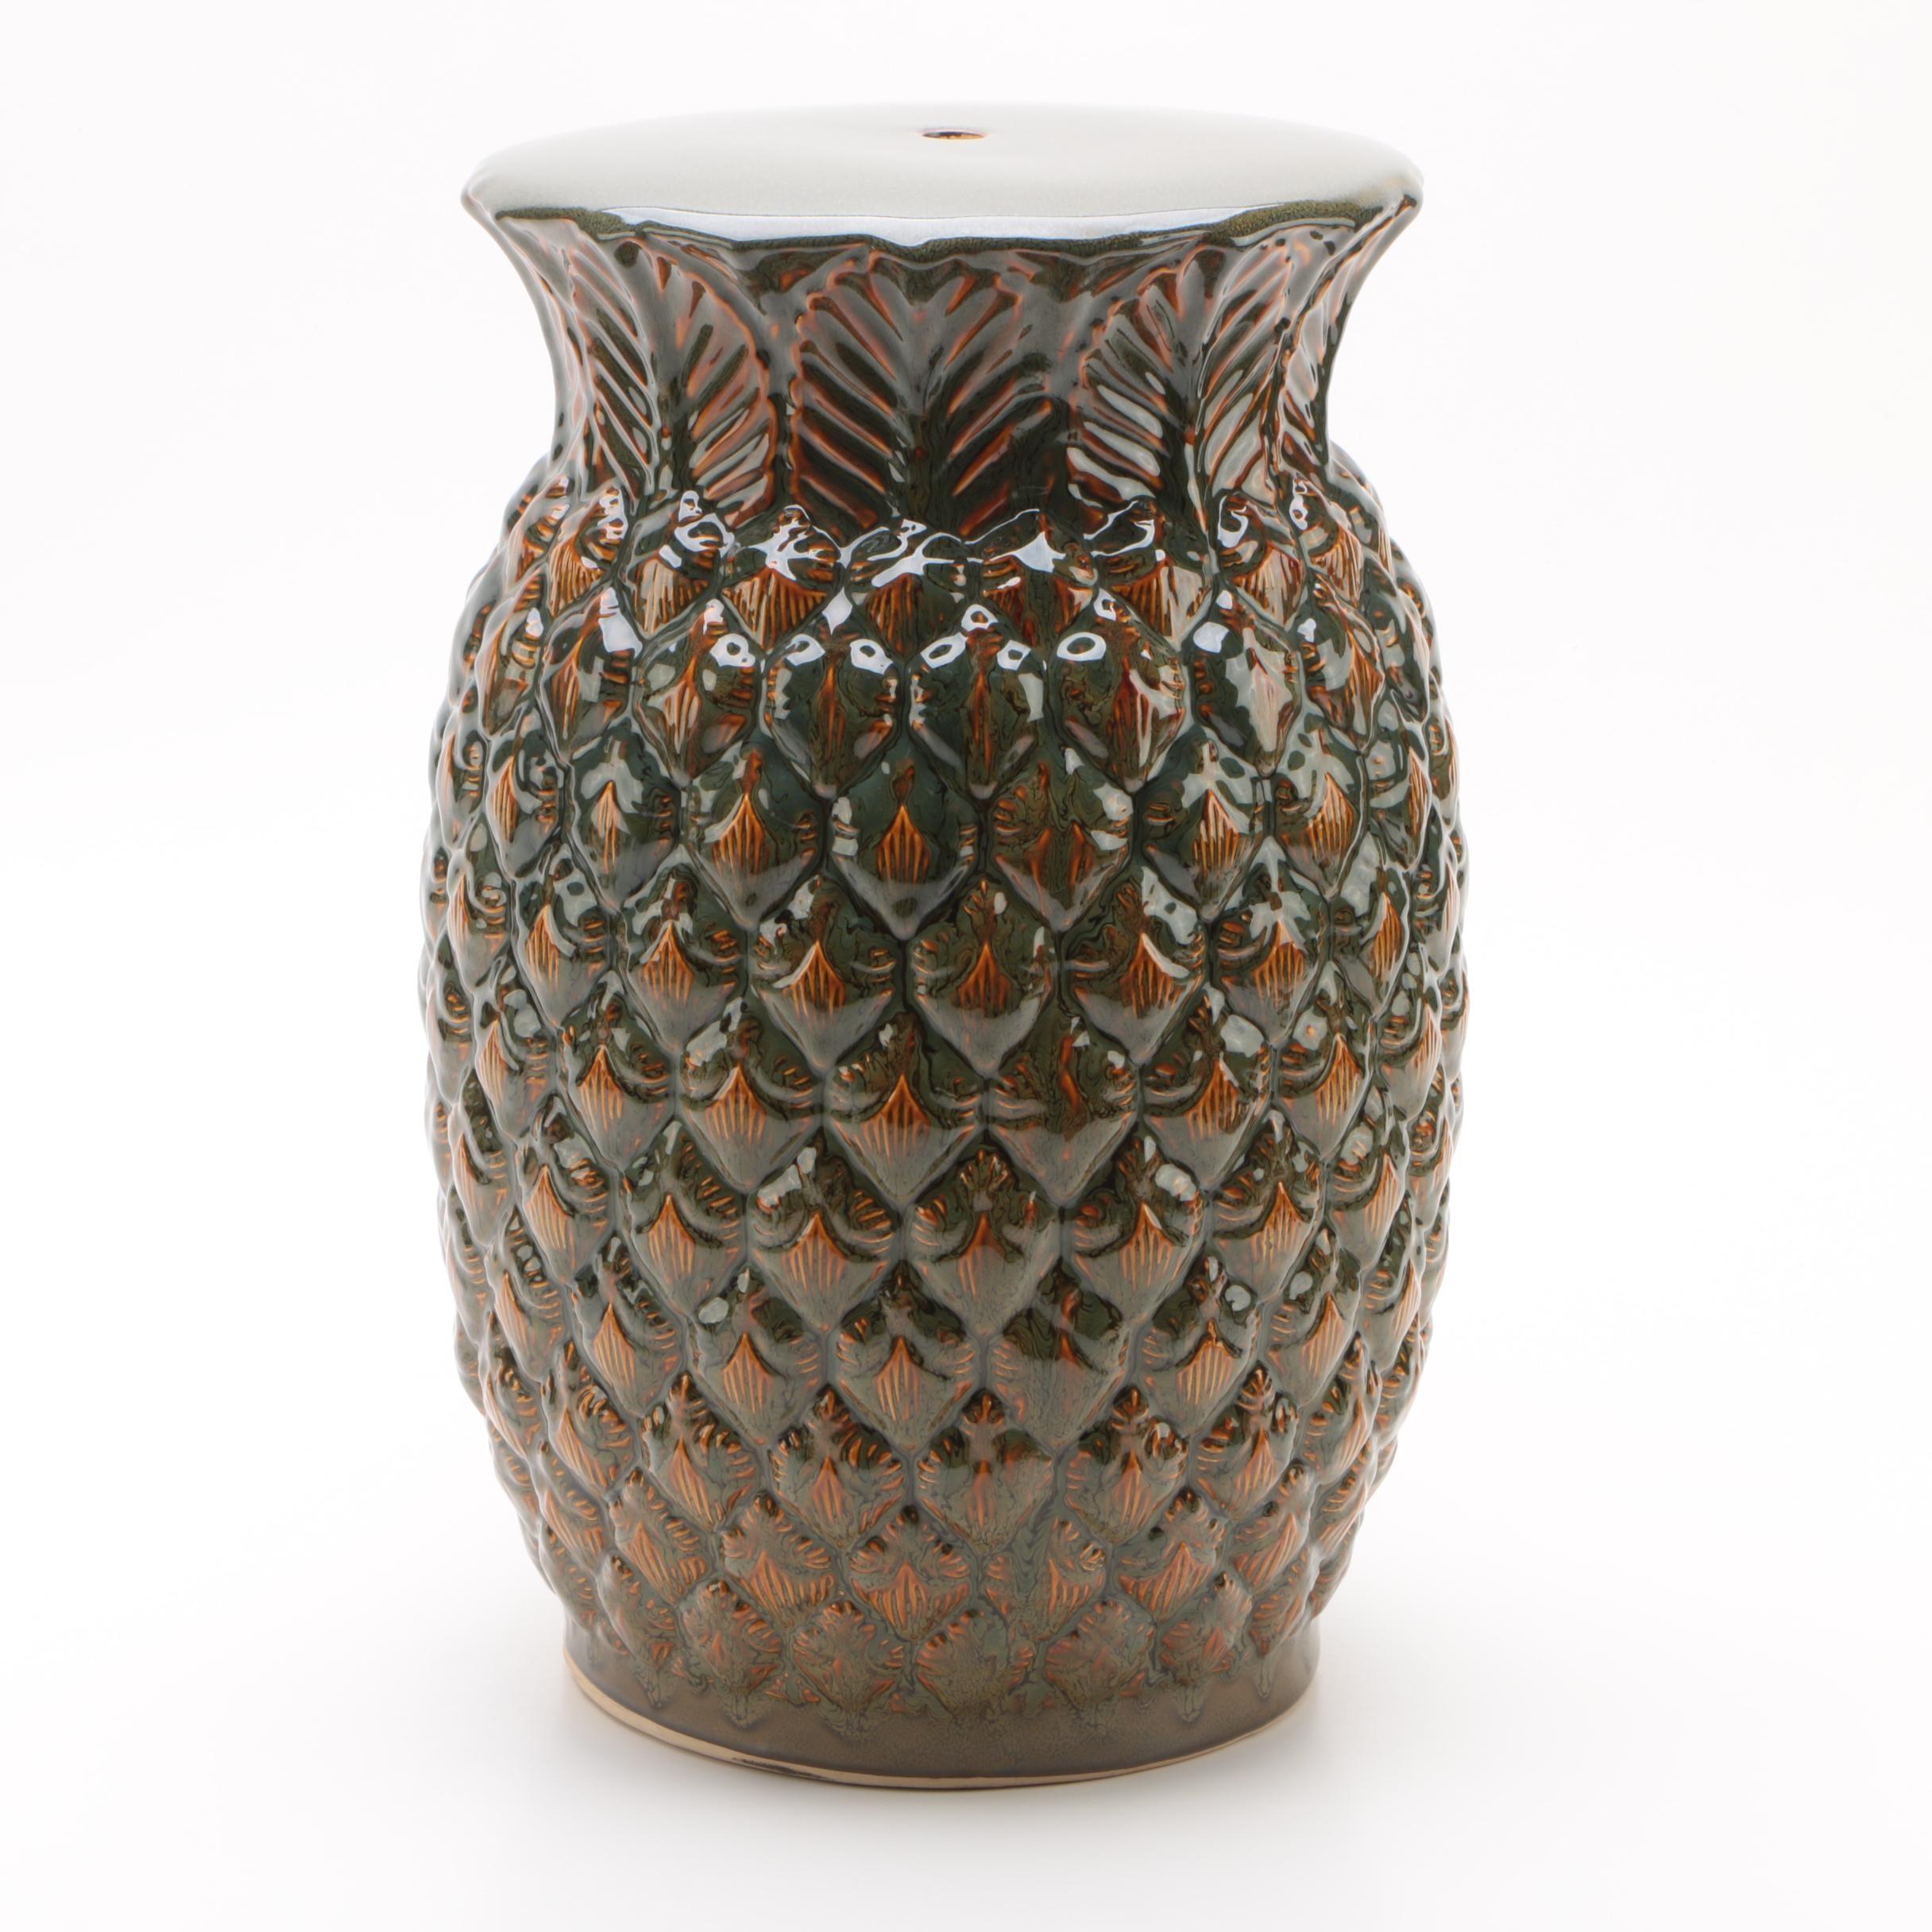 Large Ceramic Pineapple Garden Stool